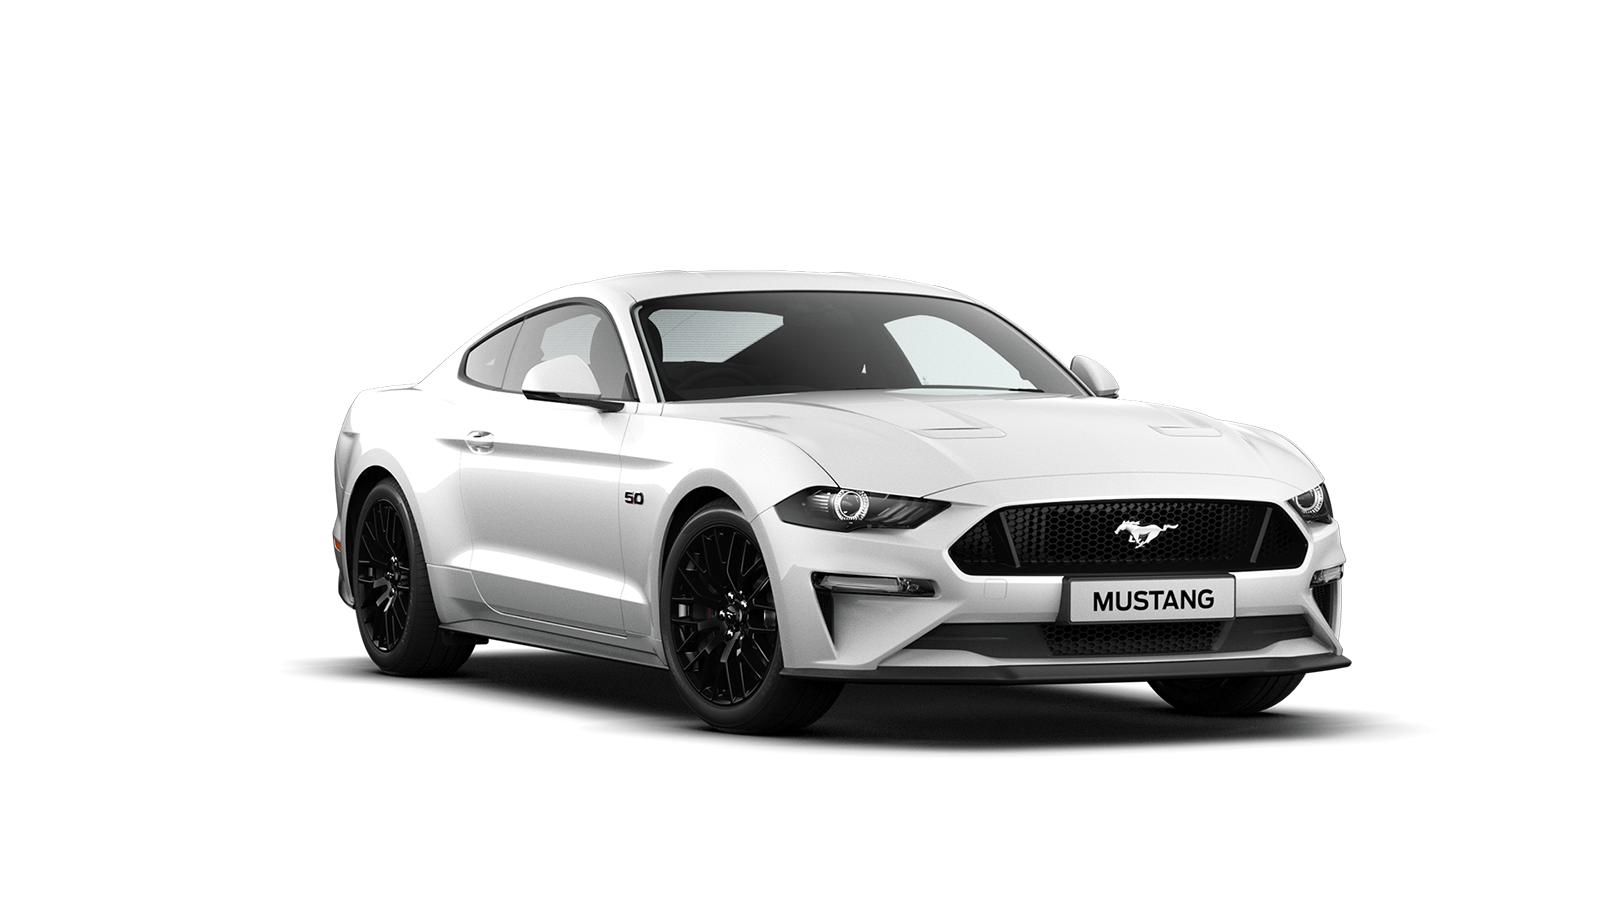 NEW MUSTANG 5.0 V8 GT Fastback in Oxford White